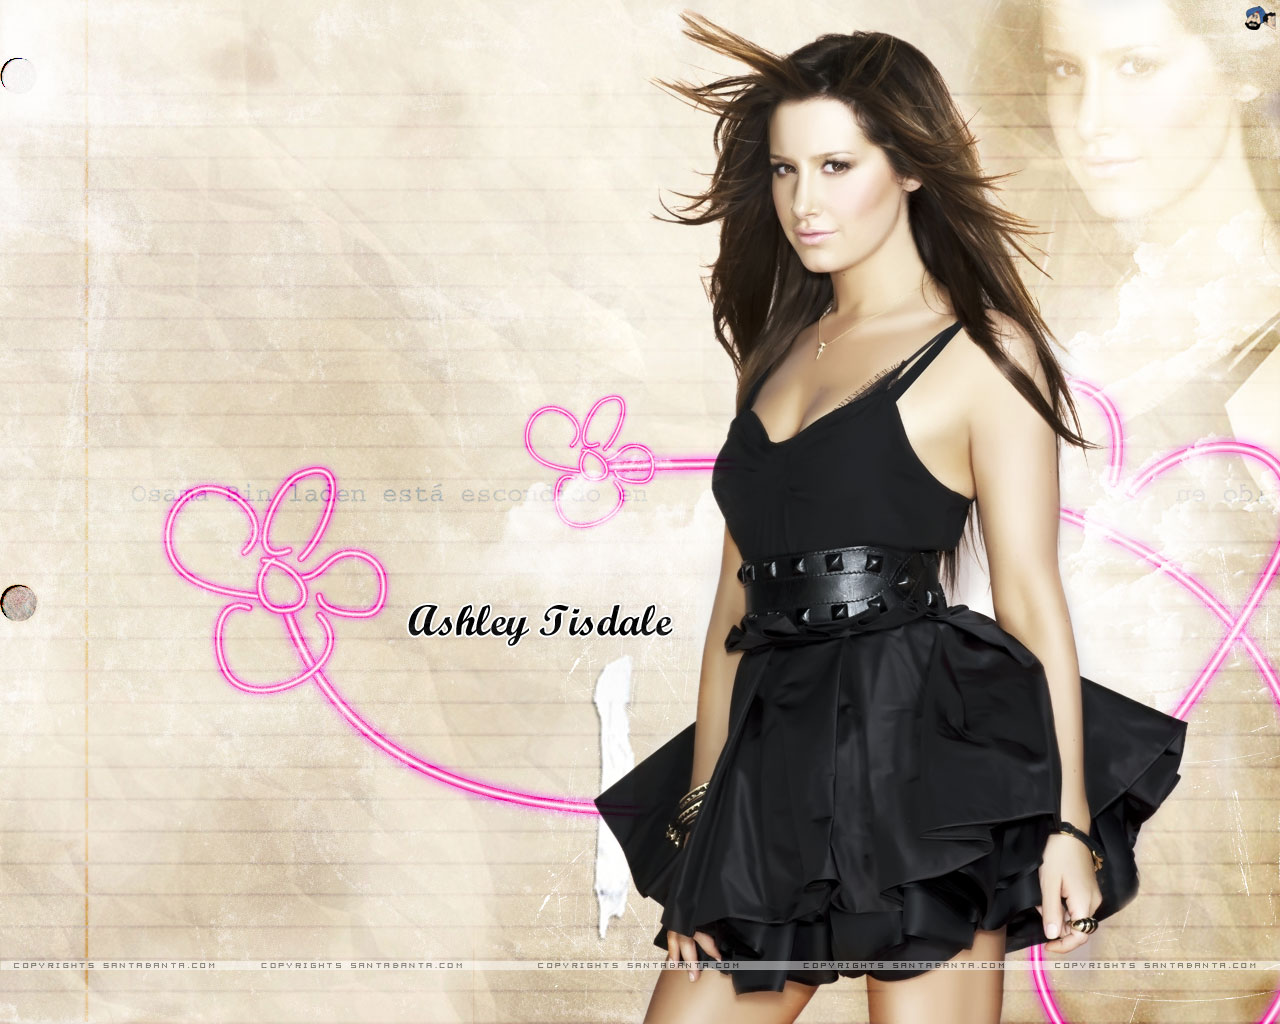 http://1.bp.blogspot.com/-8vEdCPN7SKc/TvcV0wxGpsI/AAAAAAAAFkI/XW_4cA_ZKEE/s1600/Ashley+Tisdale+Cool.jpg